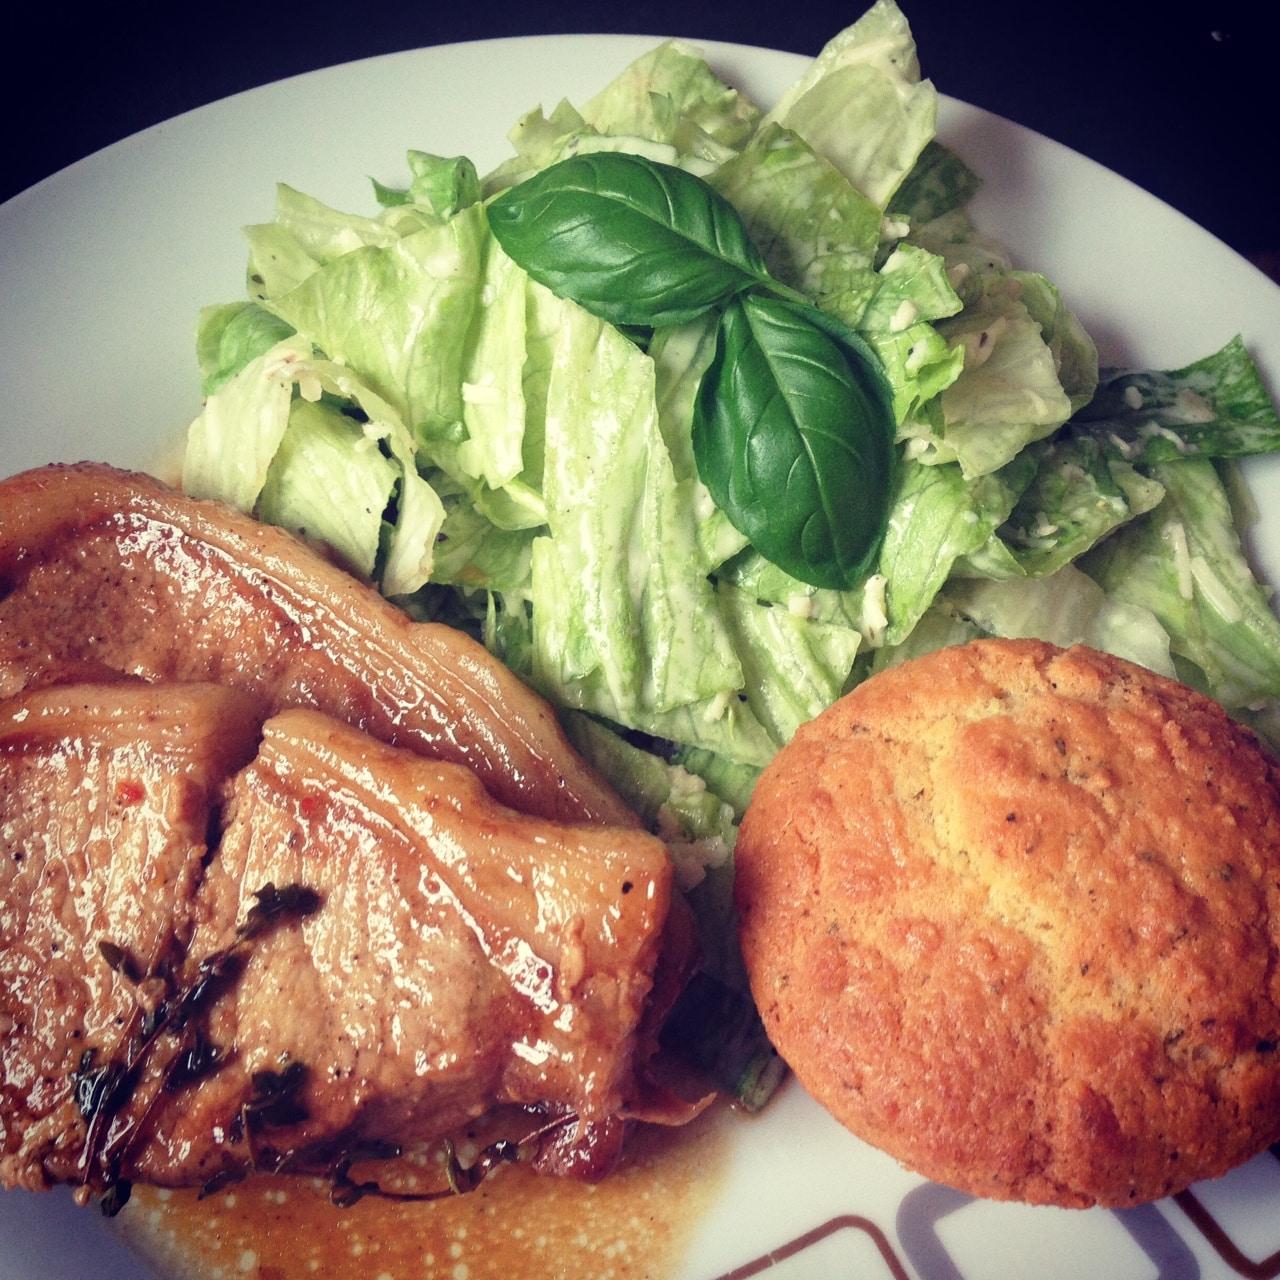 Pork chops keto bread low carb dinner